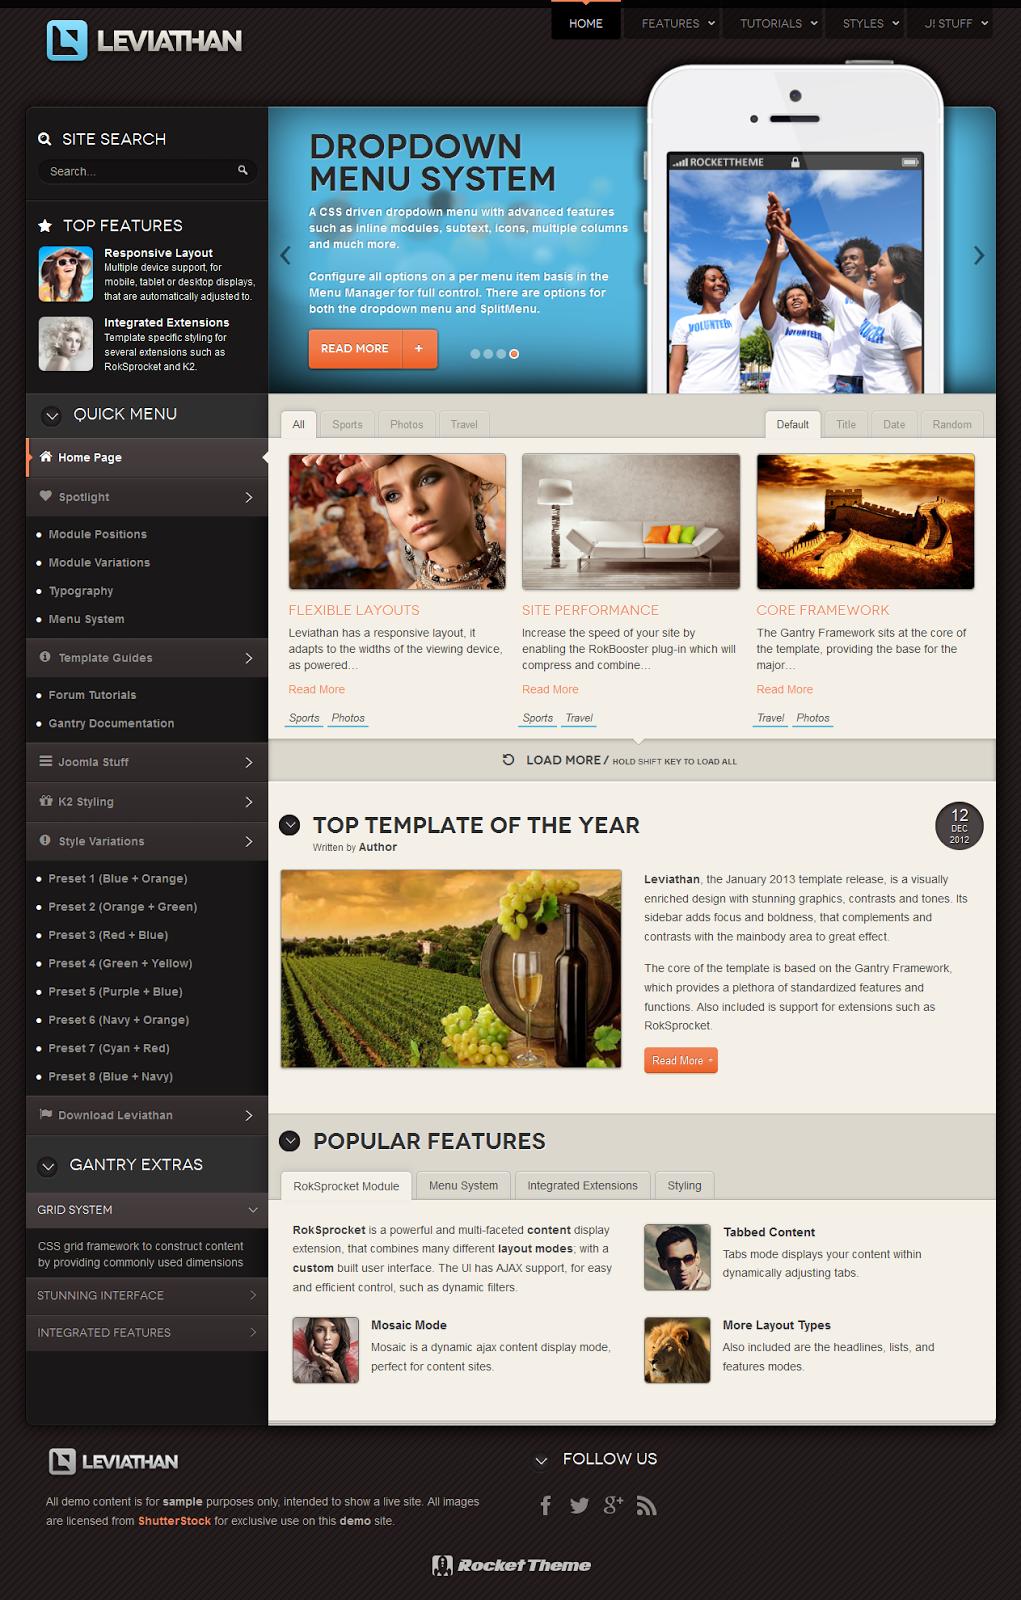 RT Leviathan - Rockettheme Joomla Template | grouping | Pinterest ...